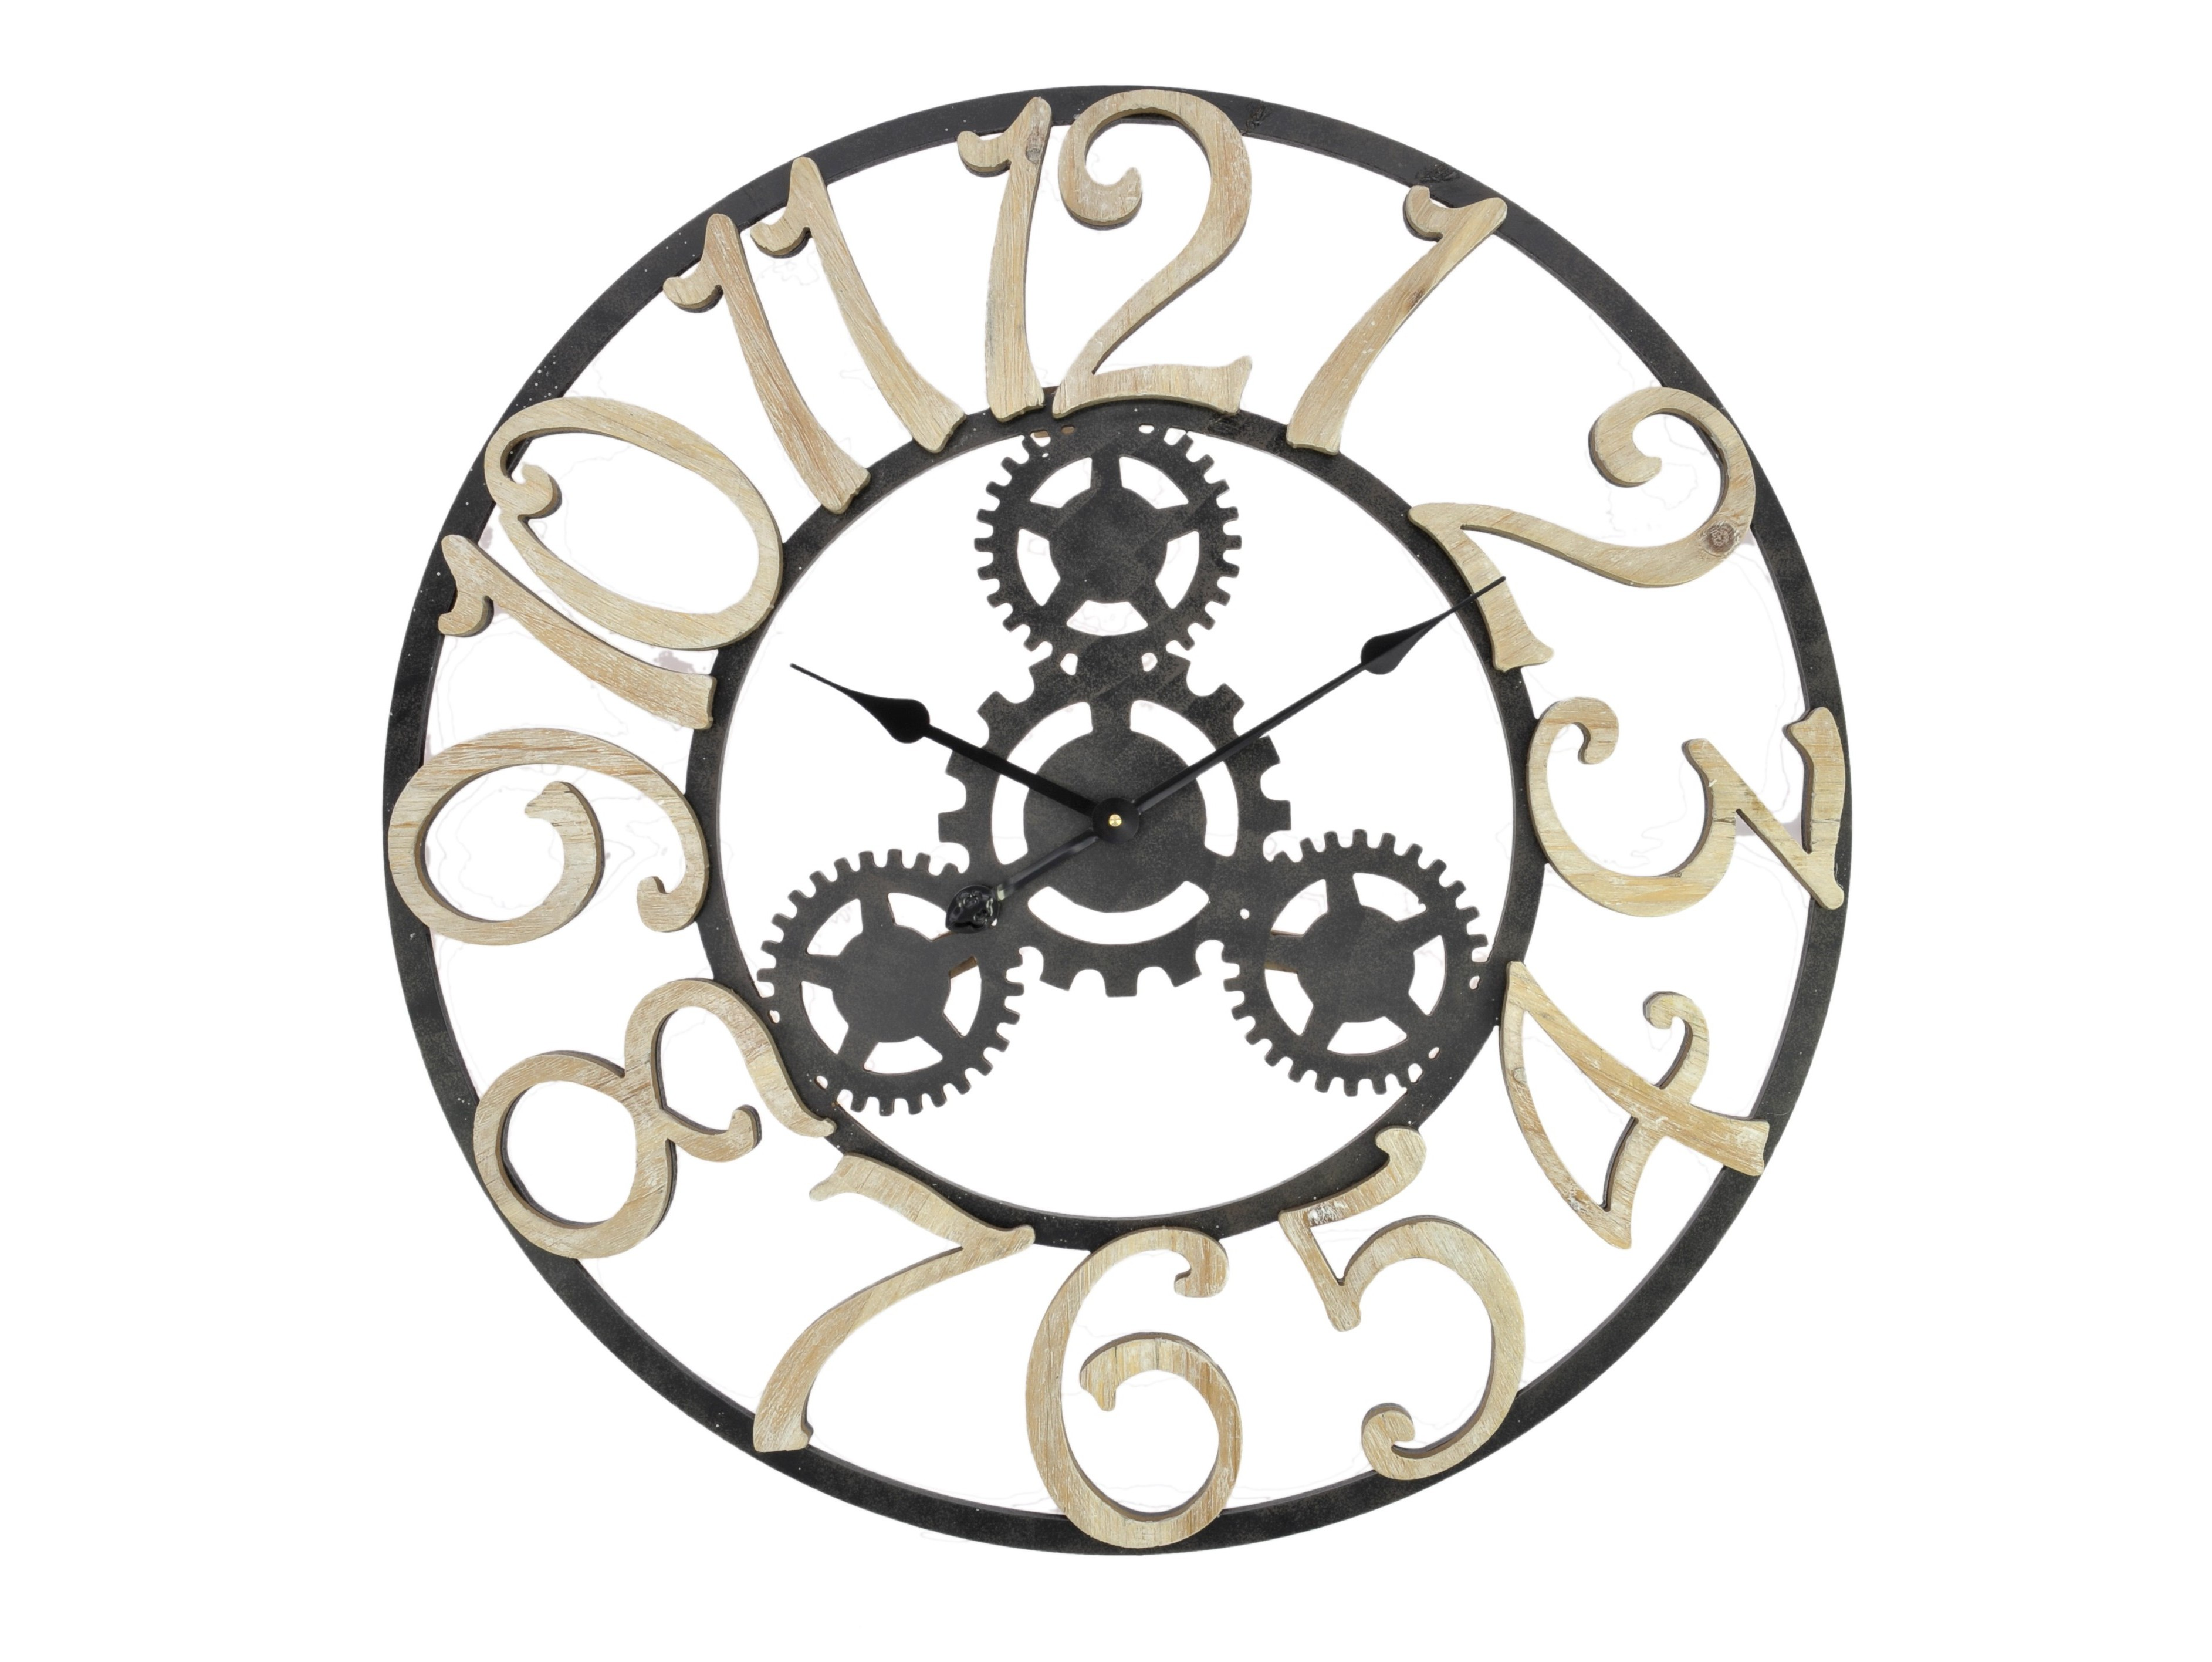 Часы настенные TriumphНастенные часы<br>кварцевый механизм<br><br>Material: Дерево<br>Width см: None<br>Depth см: 5<br>Height см: None<br>Diameter см: 75